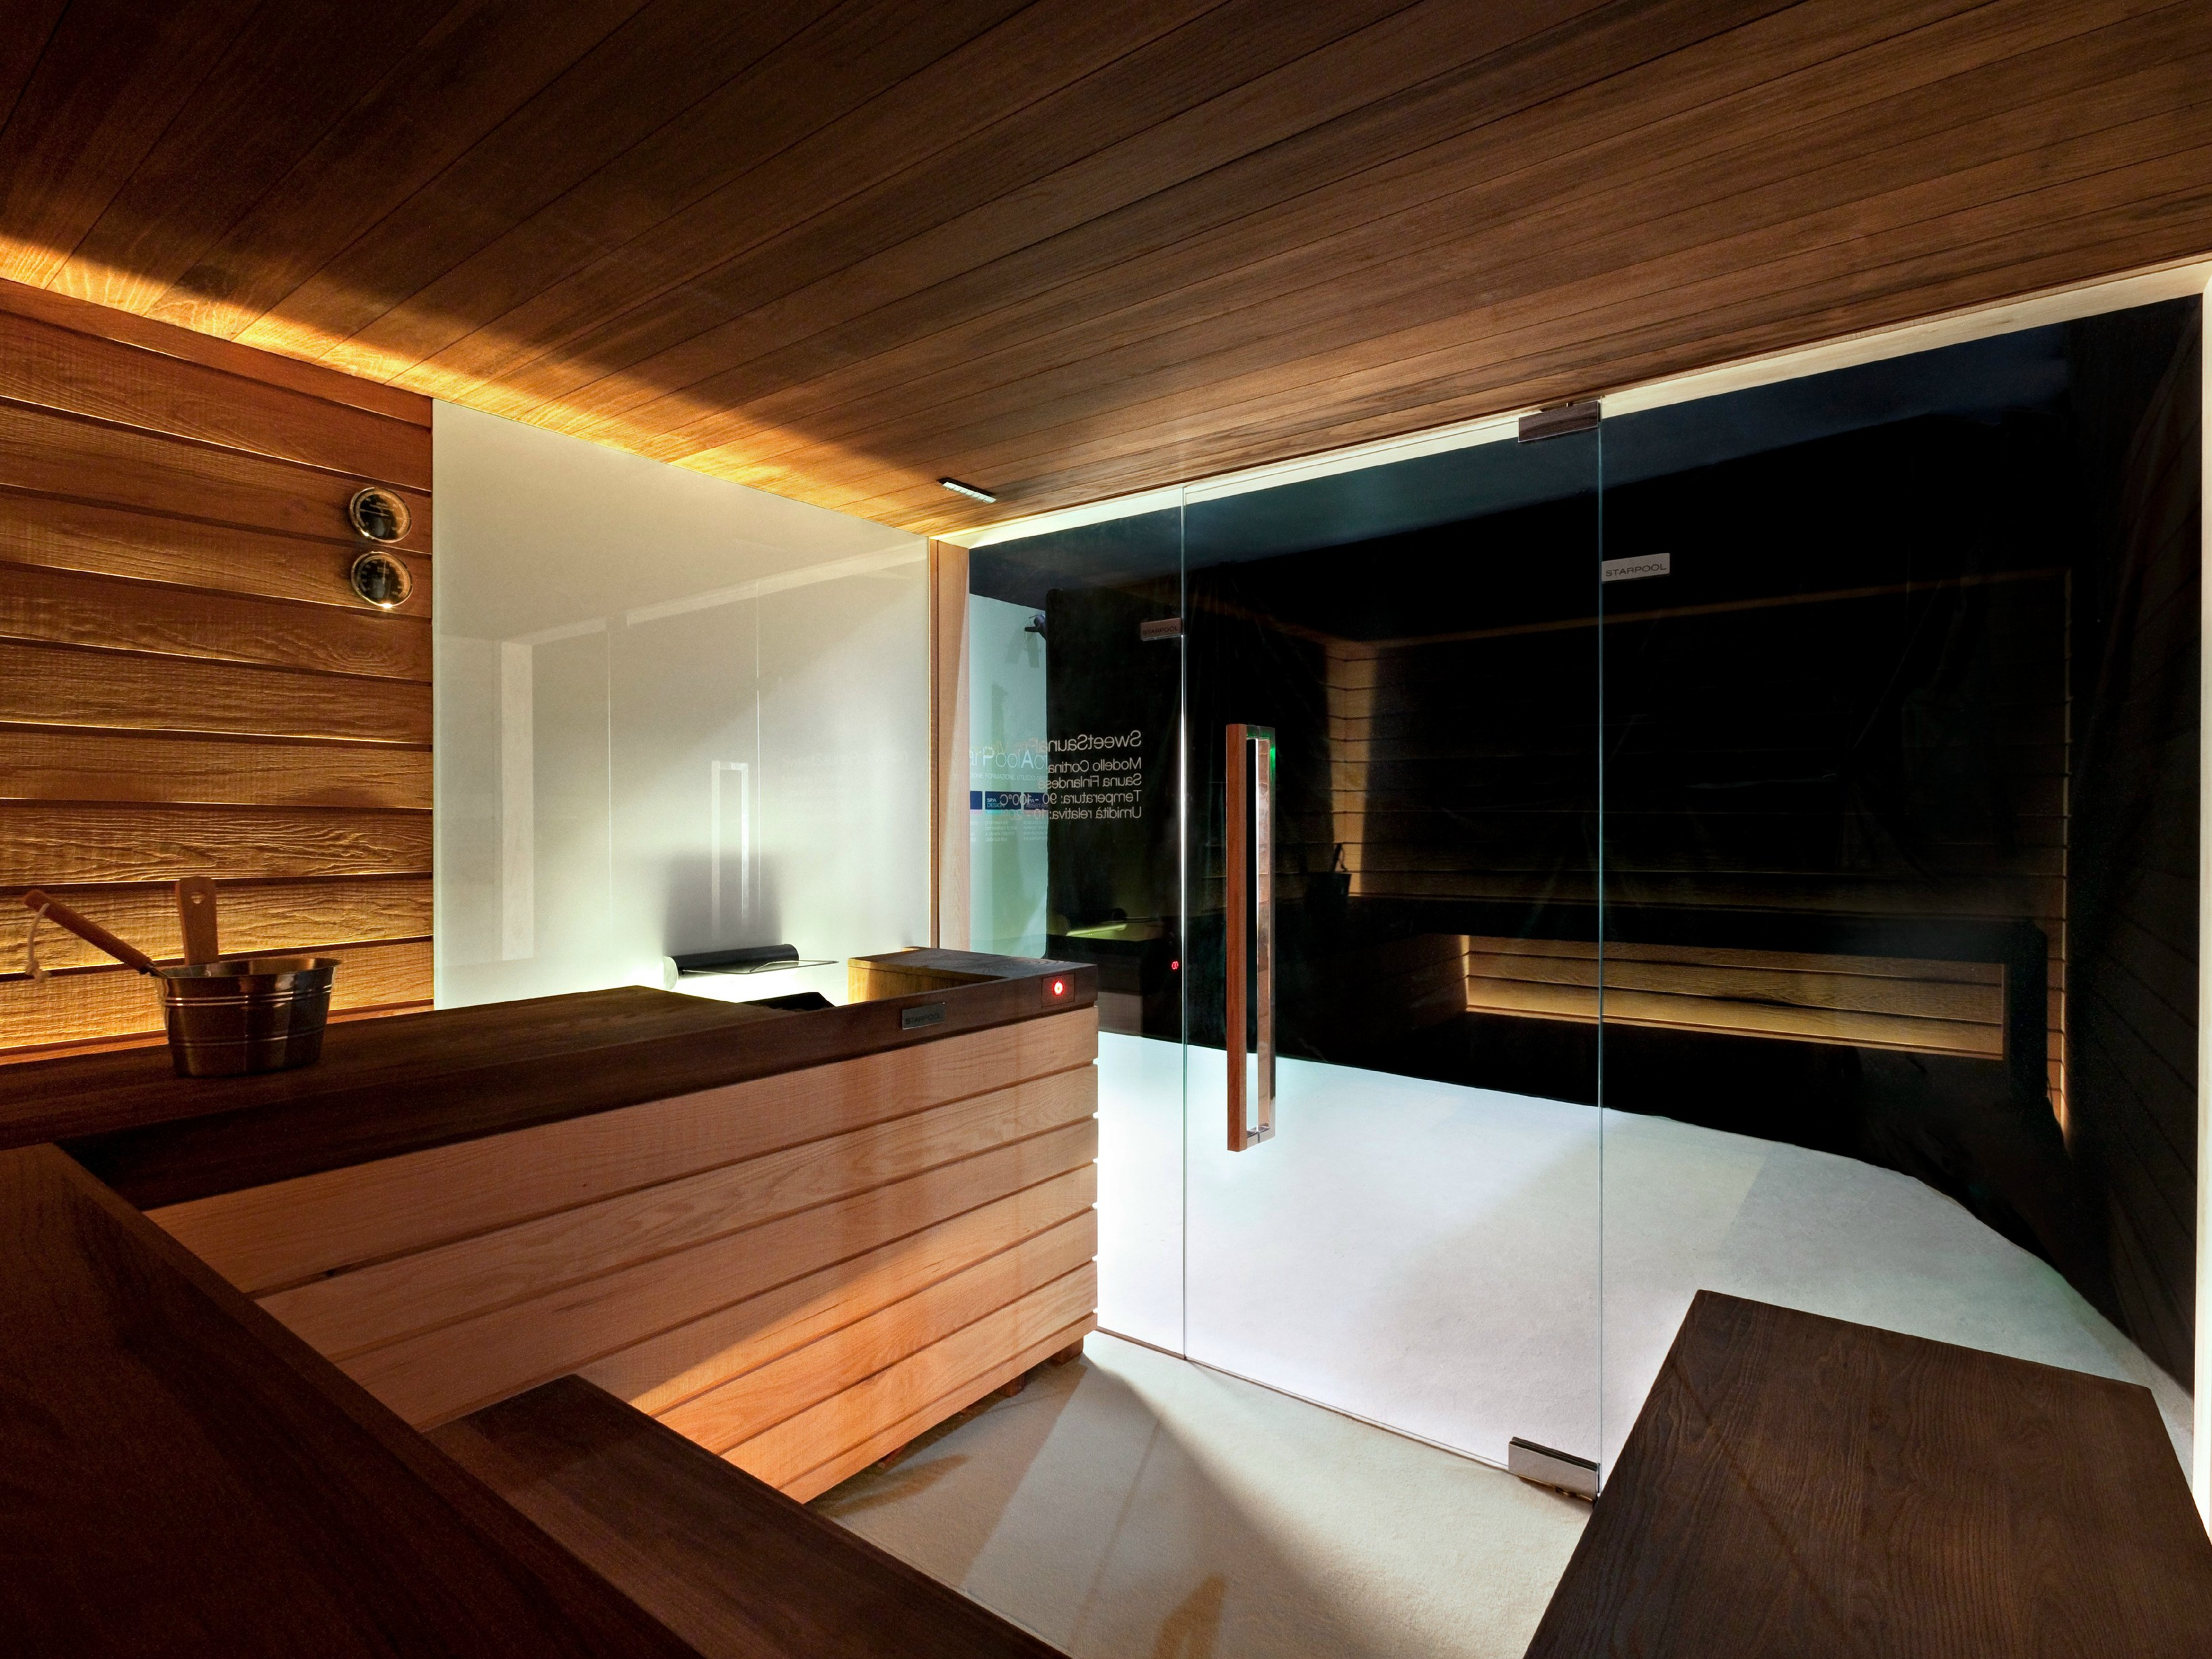 Ducha Con Baño Turco:Turkish Sauna